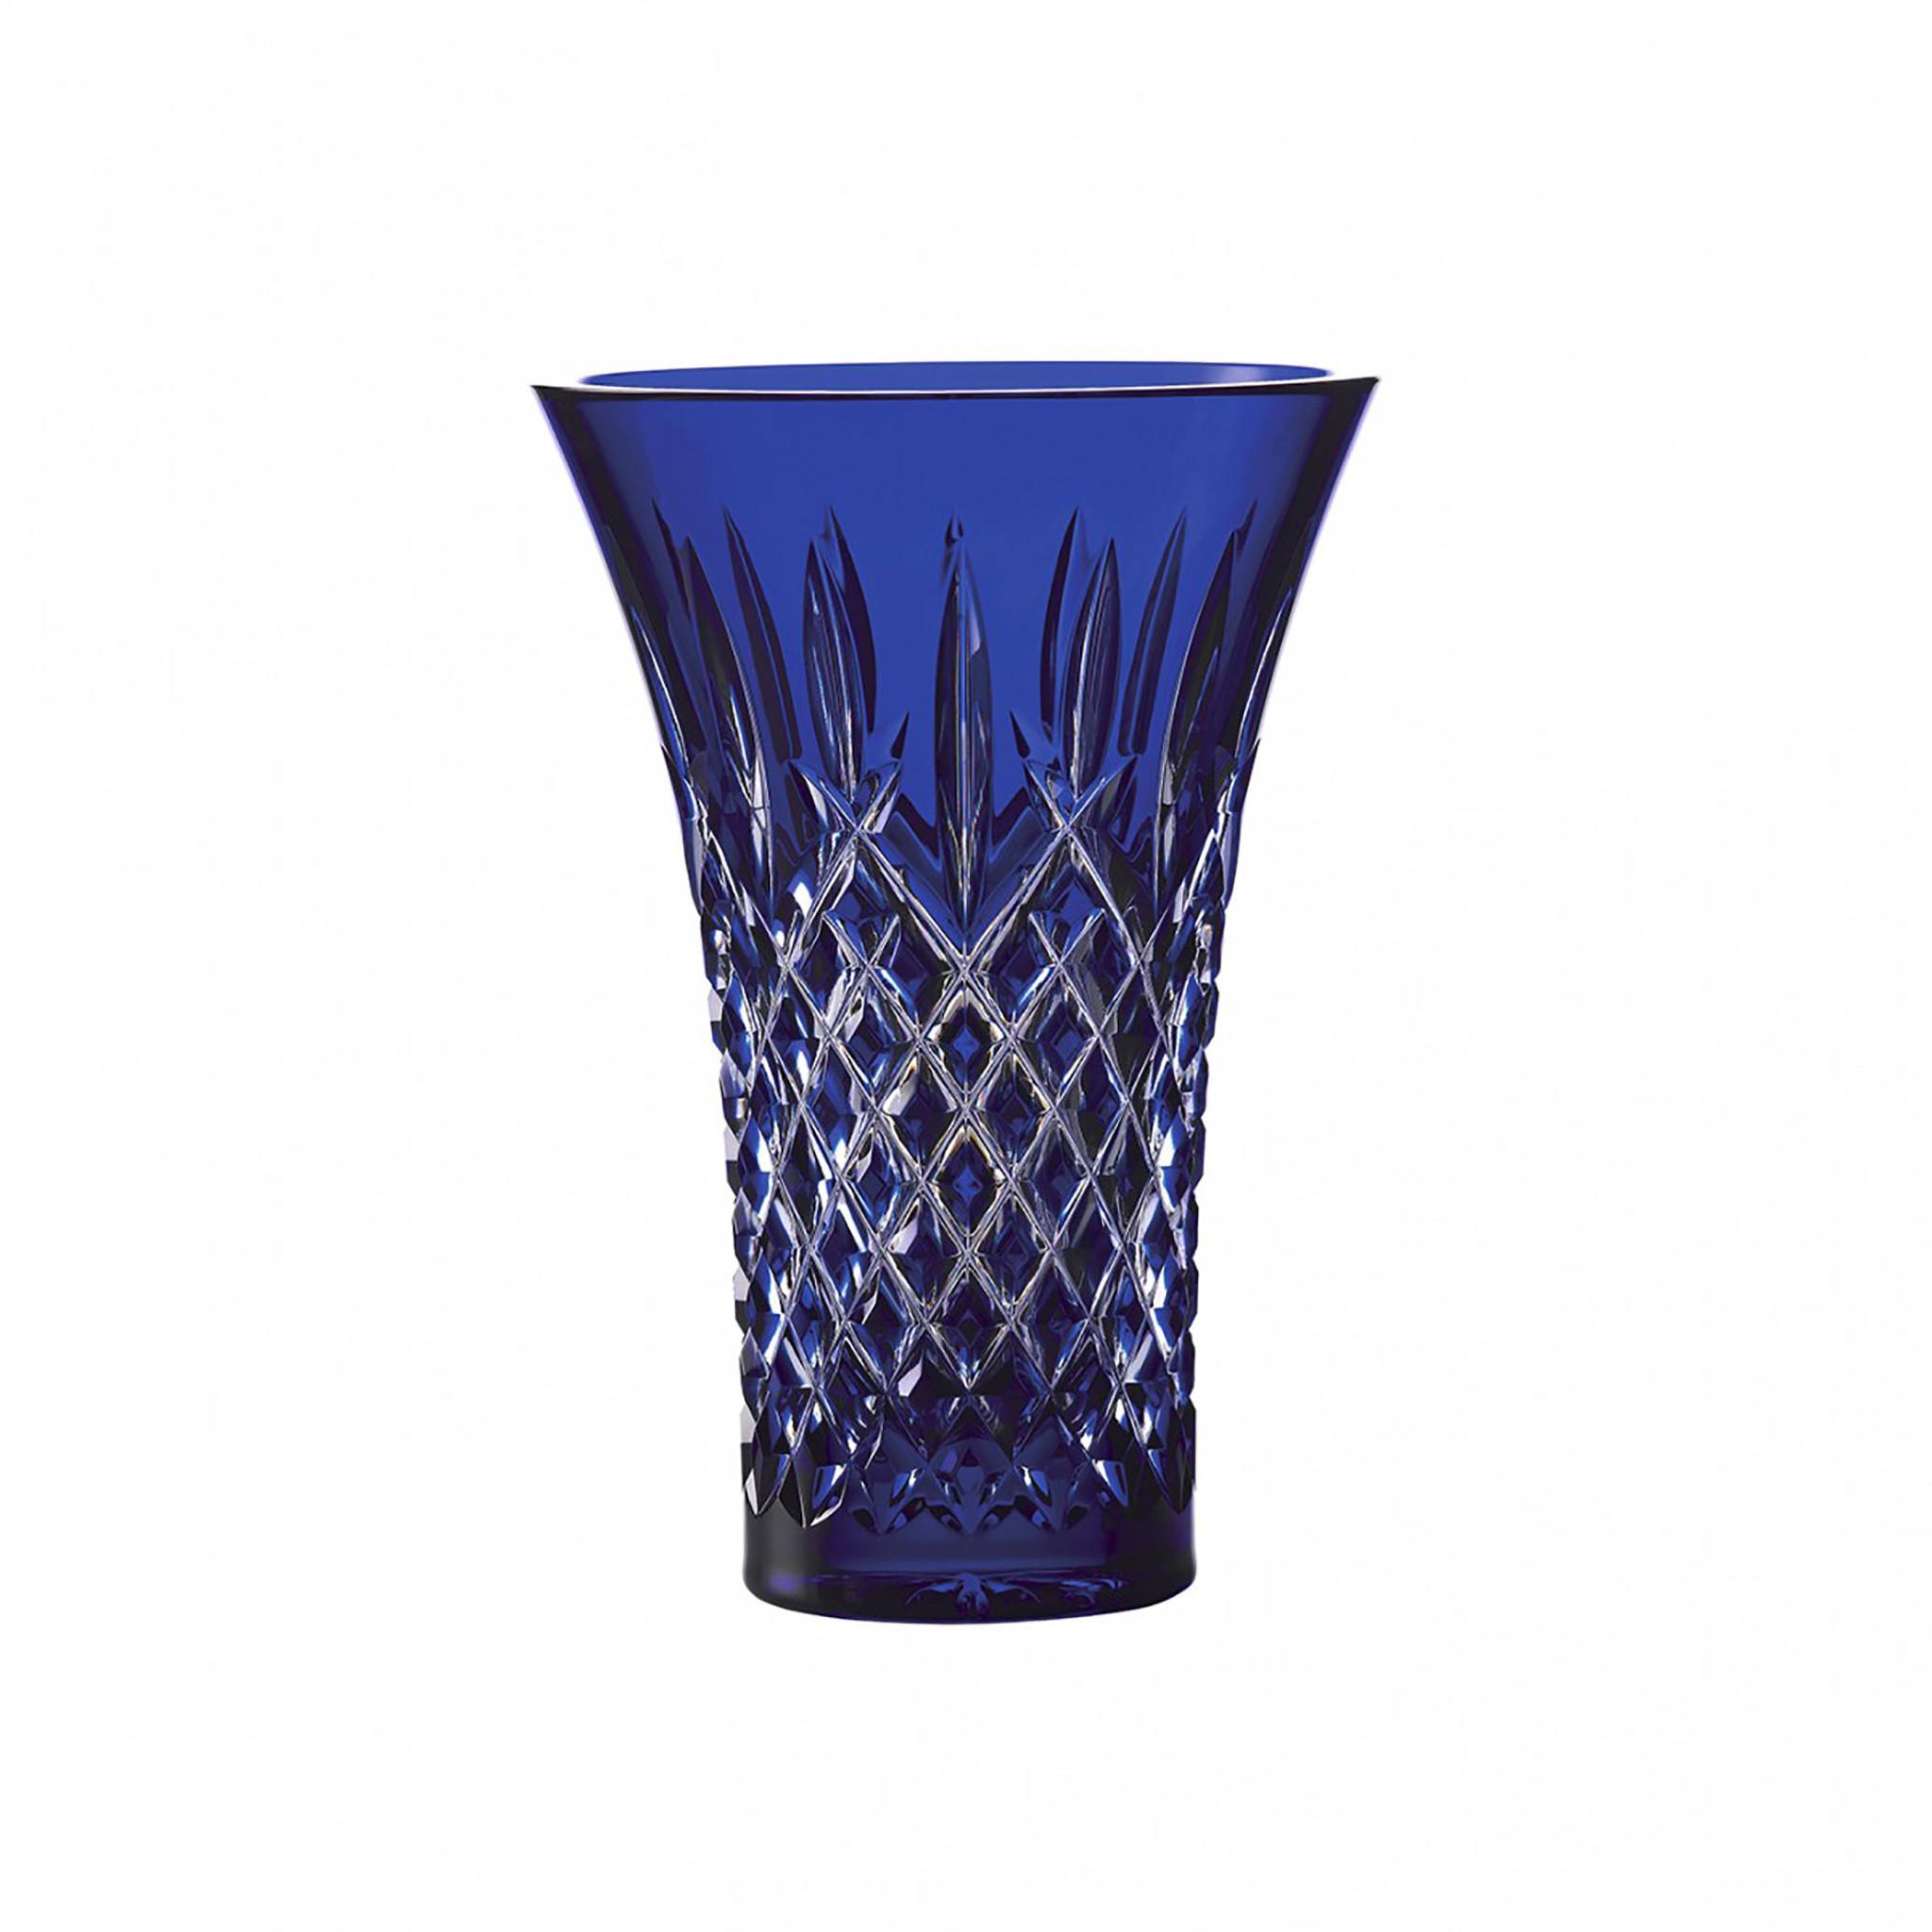 Waterford Araglin 8 inch Vase 40032737